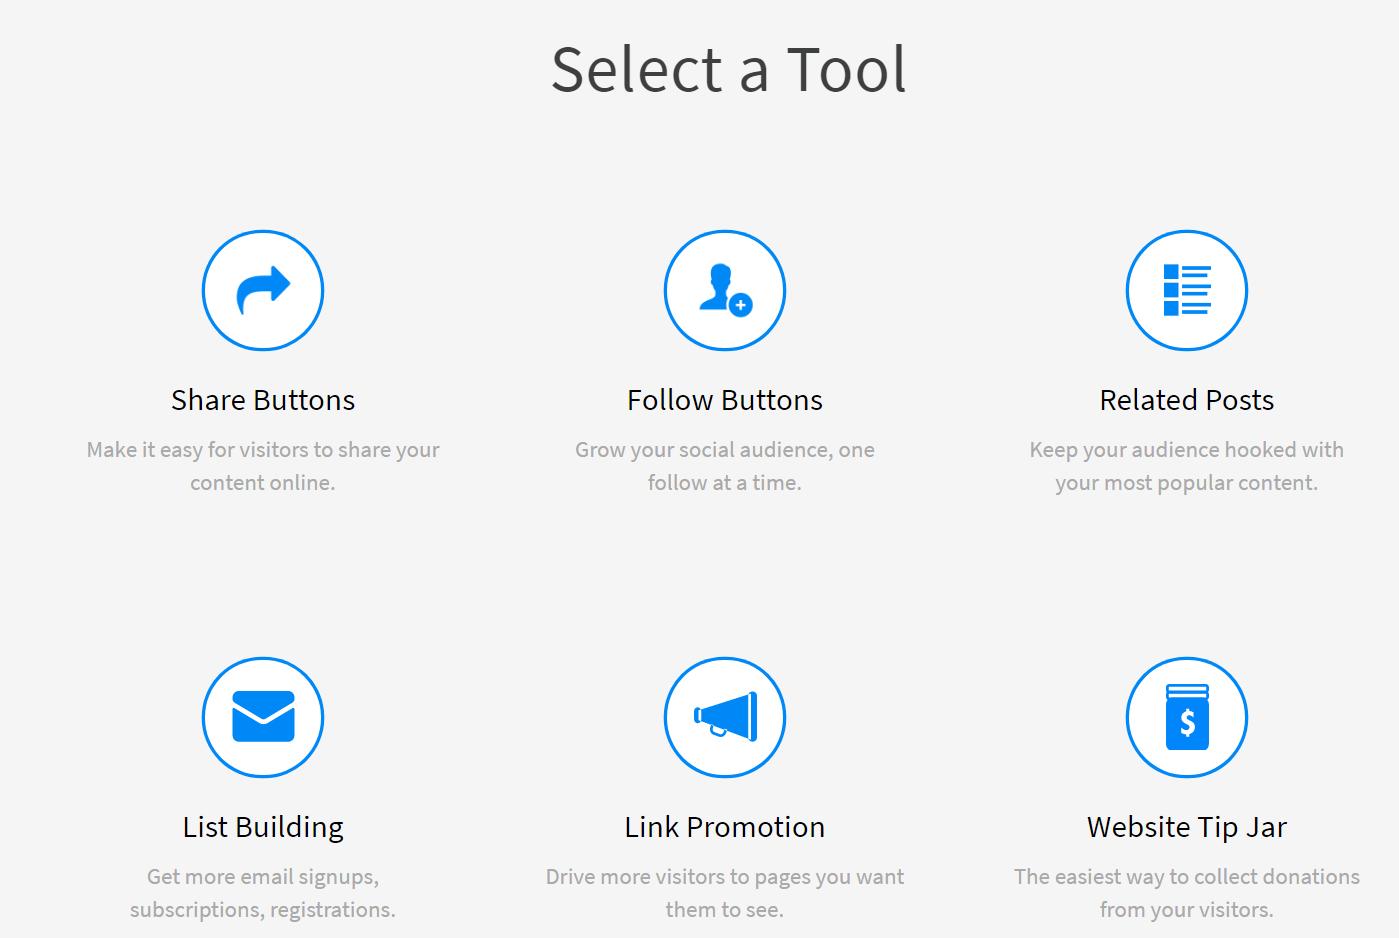 Select a Tool